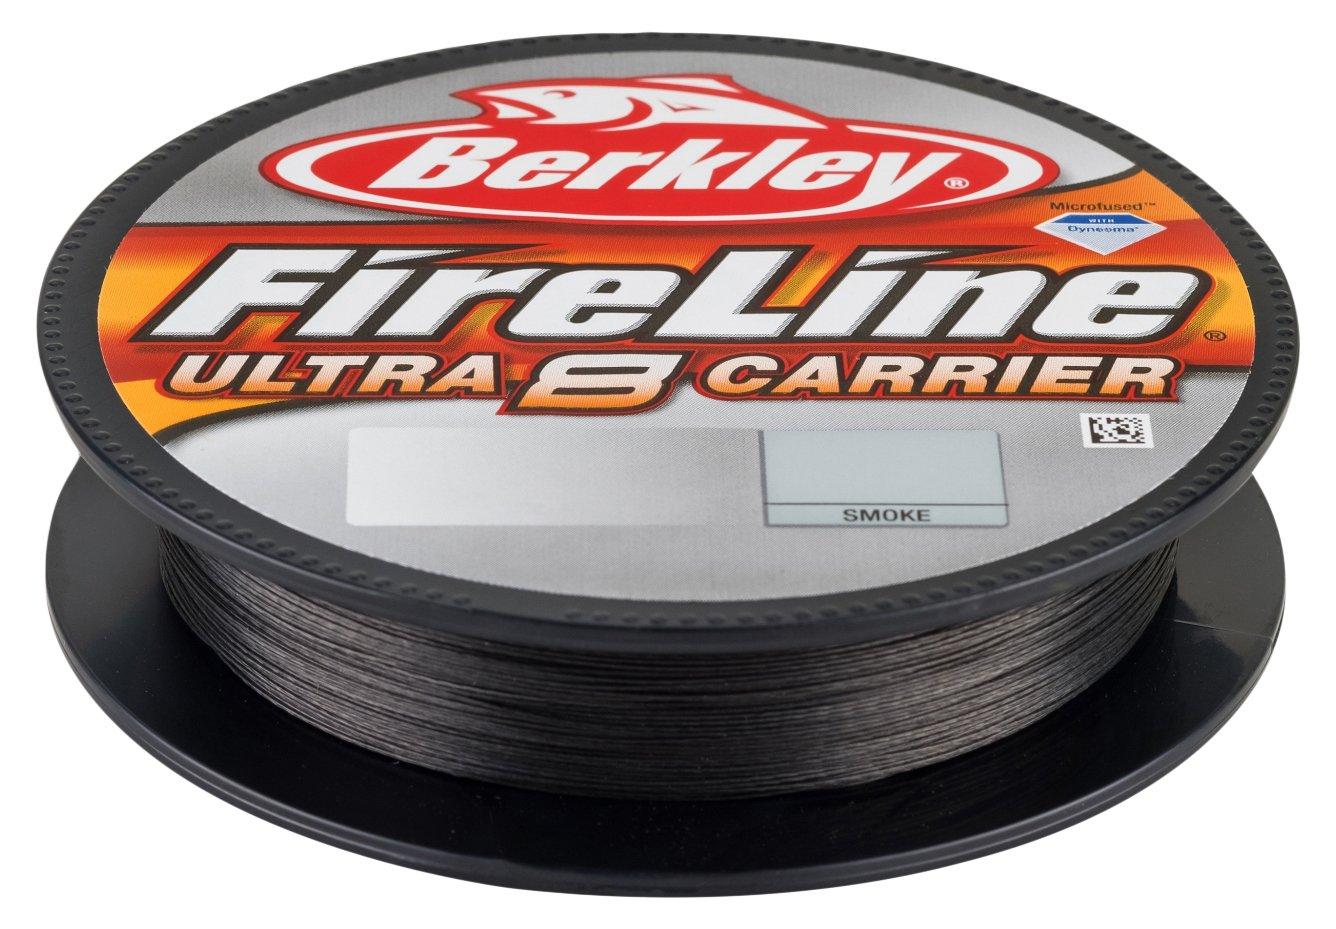 激安価格の Berkley bu8flfs17 bu8flfs17 – 42 Fireline Ultra Berkley 8釣りライン、煙、125ヤード Ultra/ 17-pound B076576T3H, Dream Link:2cba4715 --- a0267596.xsph.ru